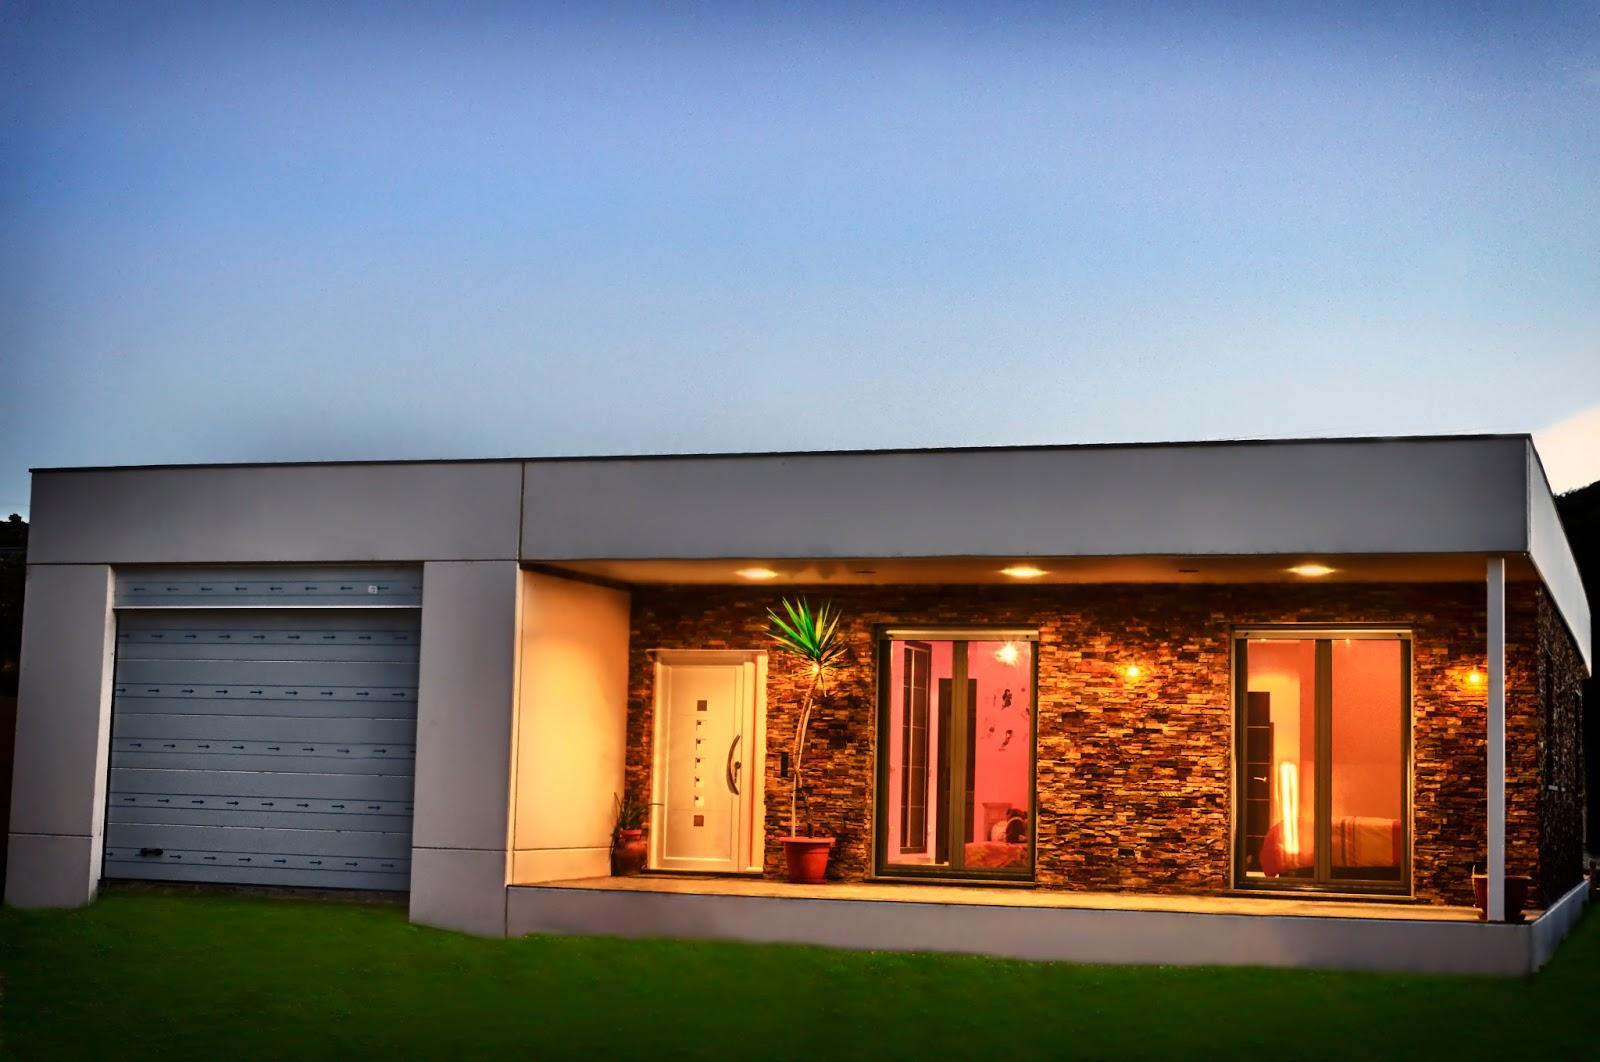 Casas de madera prefabricadas casas prefabricadas de hormigon precios economicos - Casas modulares modernas precios ...